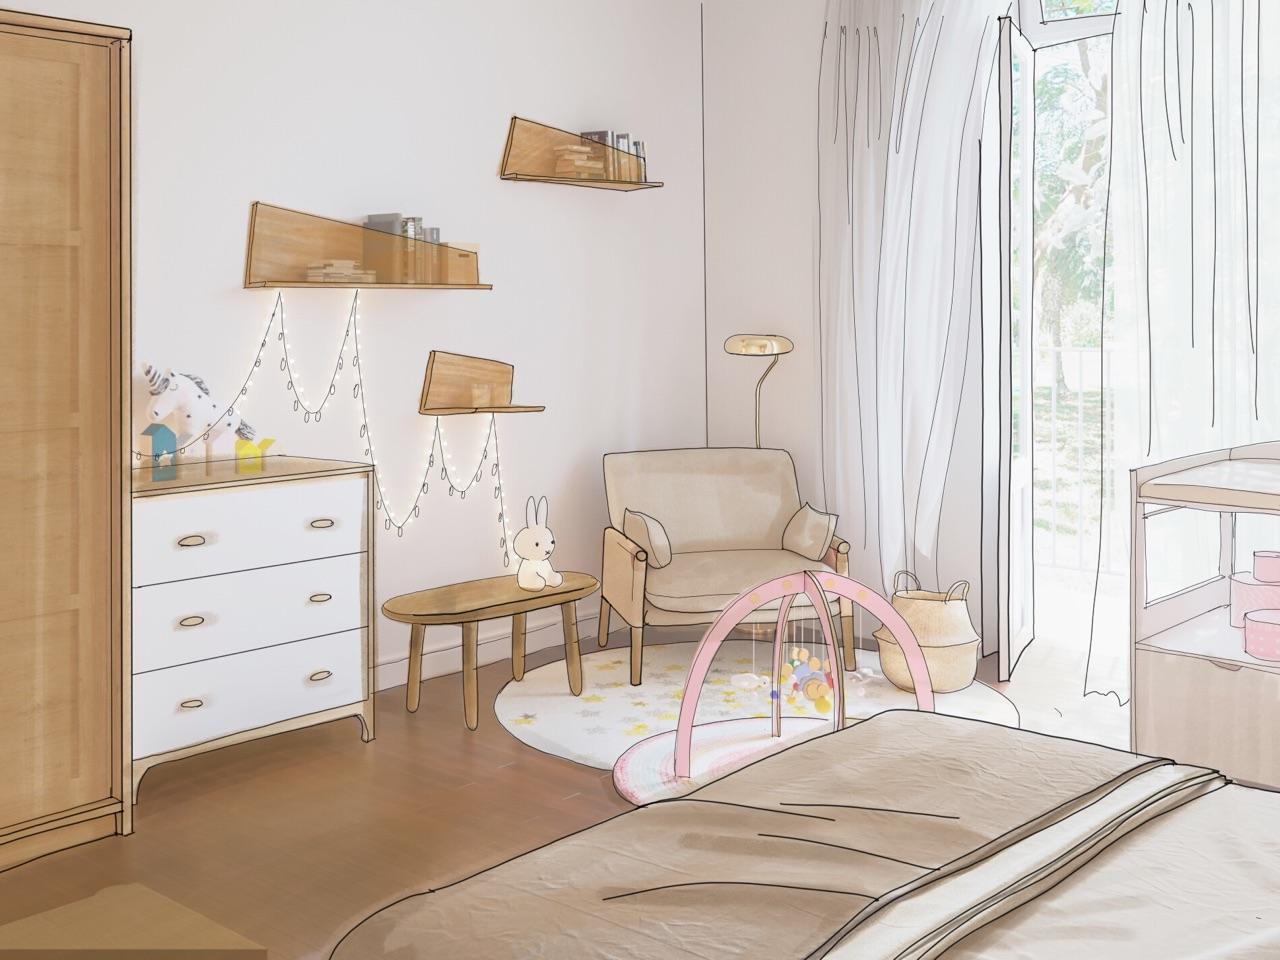 comment am nager un coin b b dans une chambre parentale madame figaro. Black Bedroom Furniture Sets. Home Design Ideas